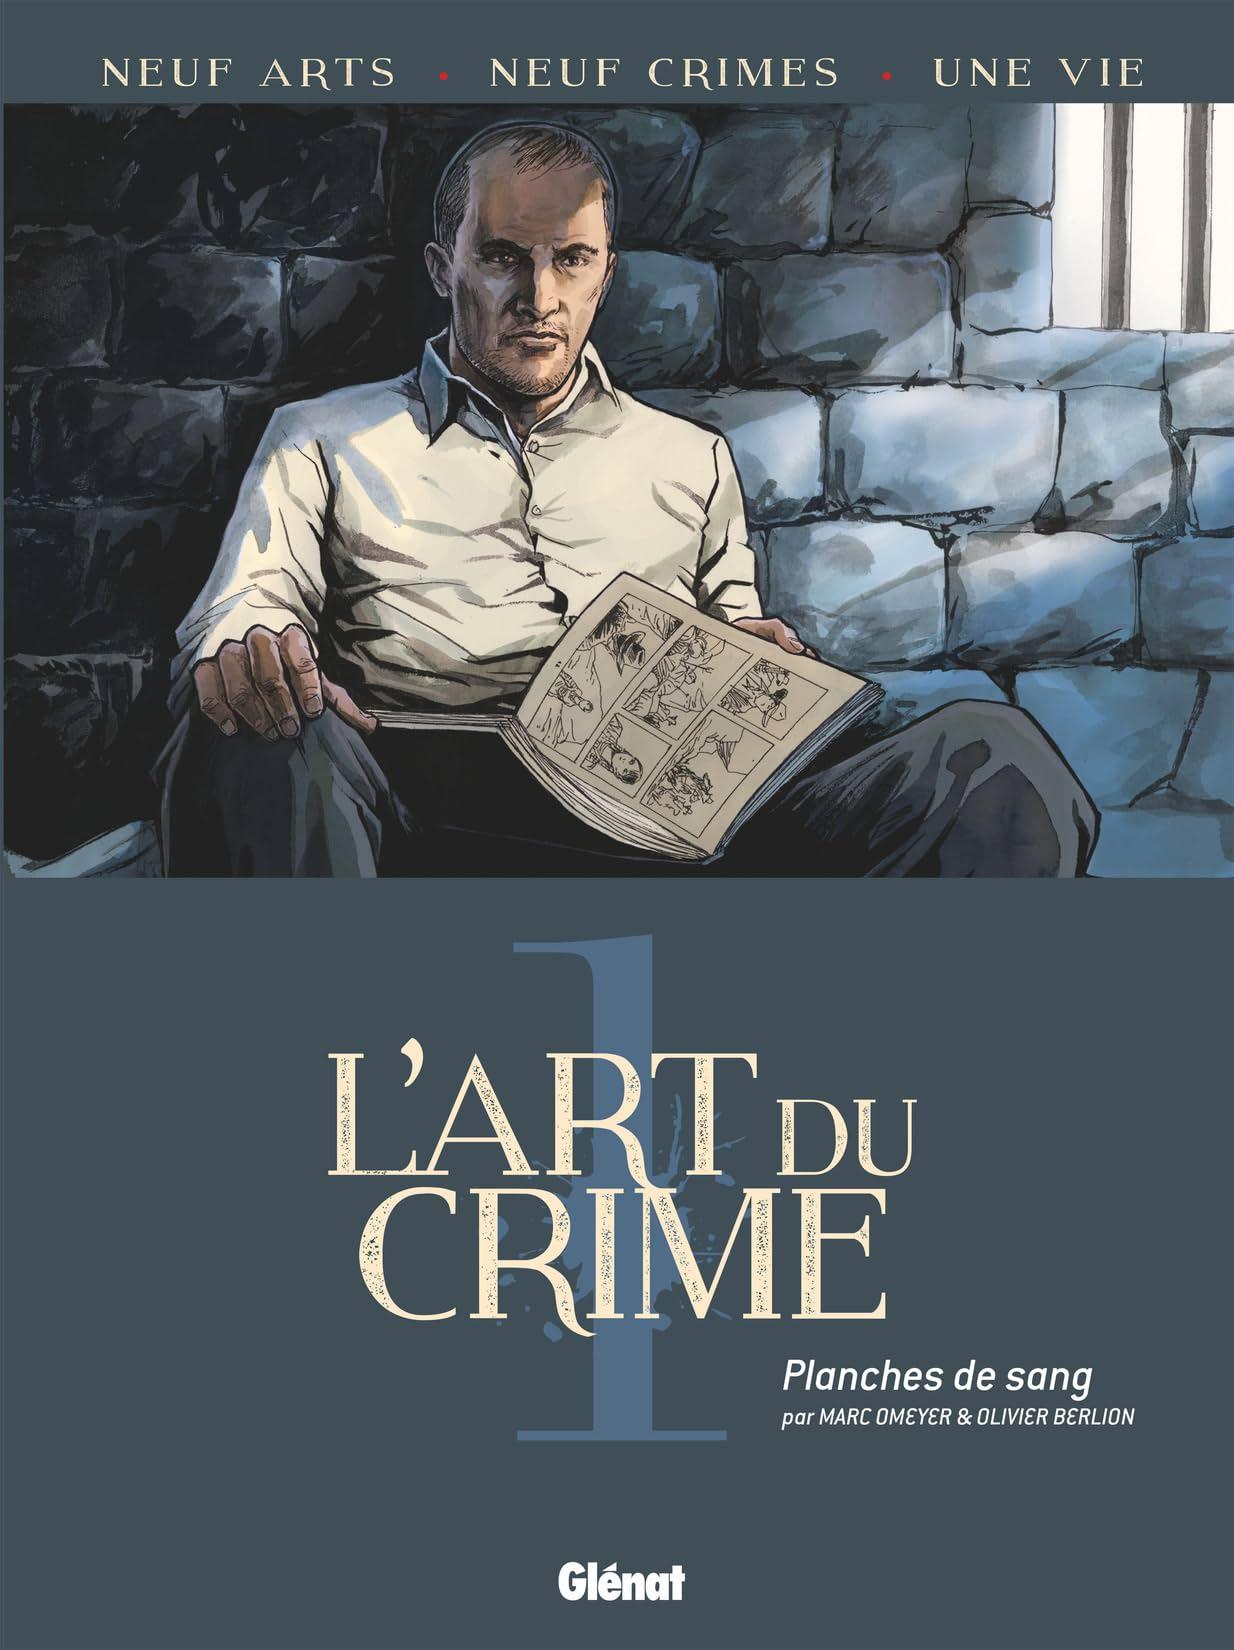 L'art du crime Vol. 1: Planches de sang